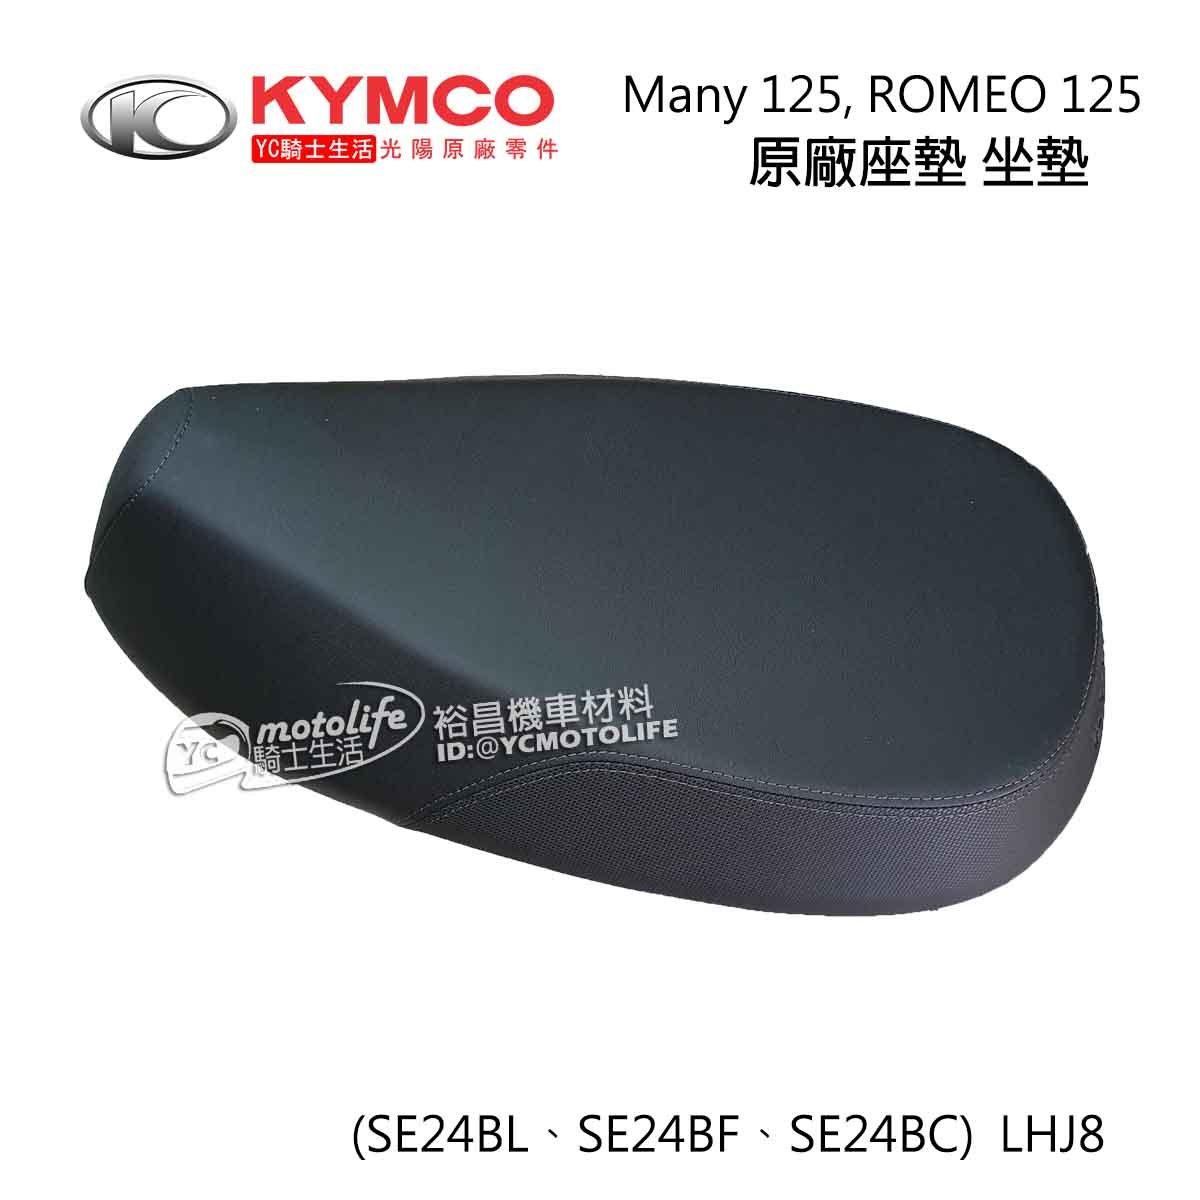 YC騎士生活_KYMCO光陽原廠 坐墊 魅力 MANY、ROMEO 125 座墊 座椅 正廠 SE24BL、BF、BC